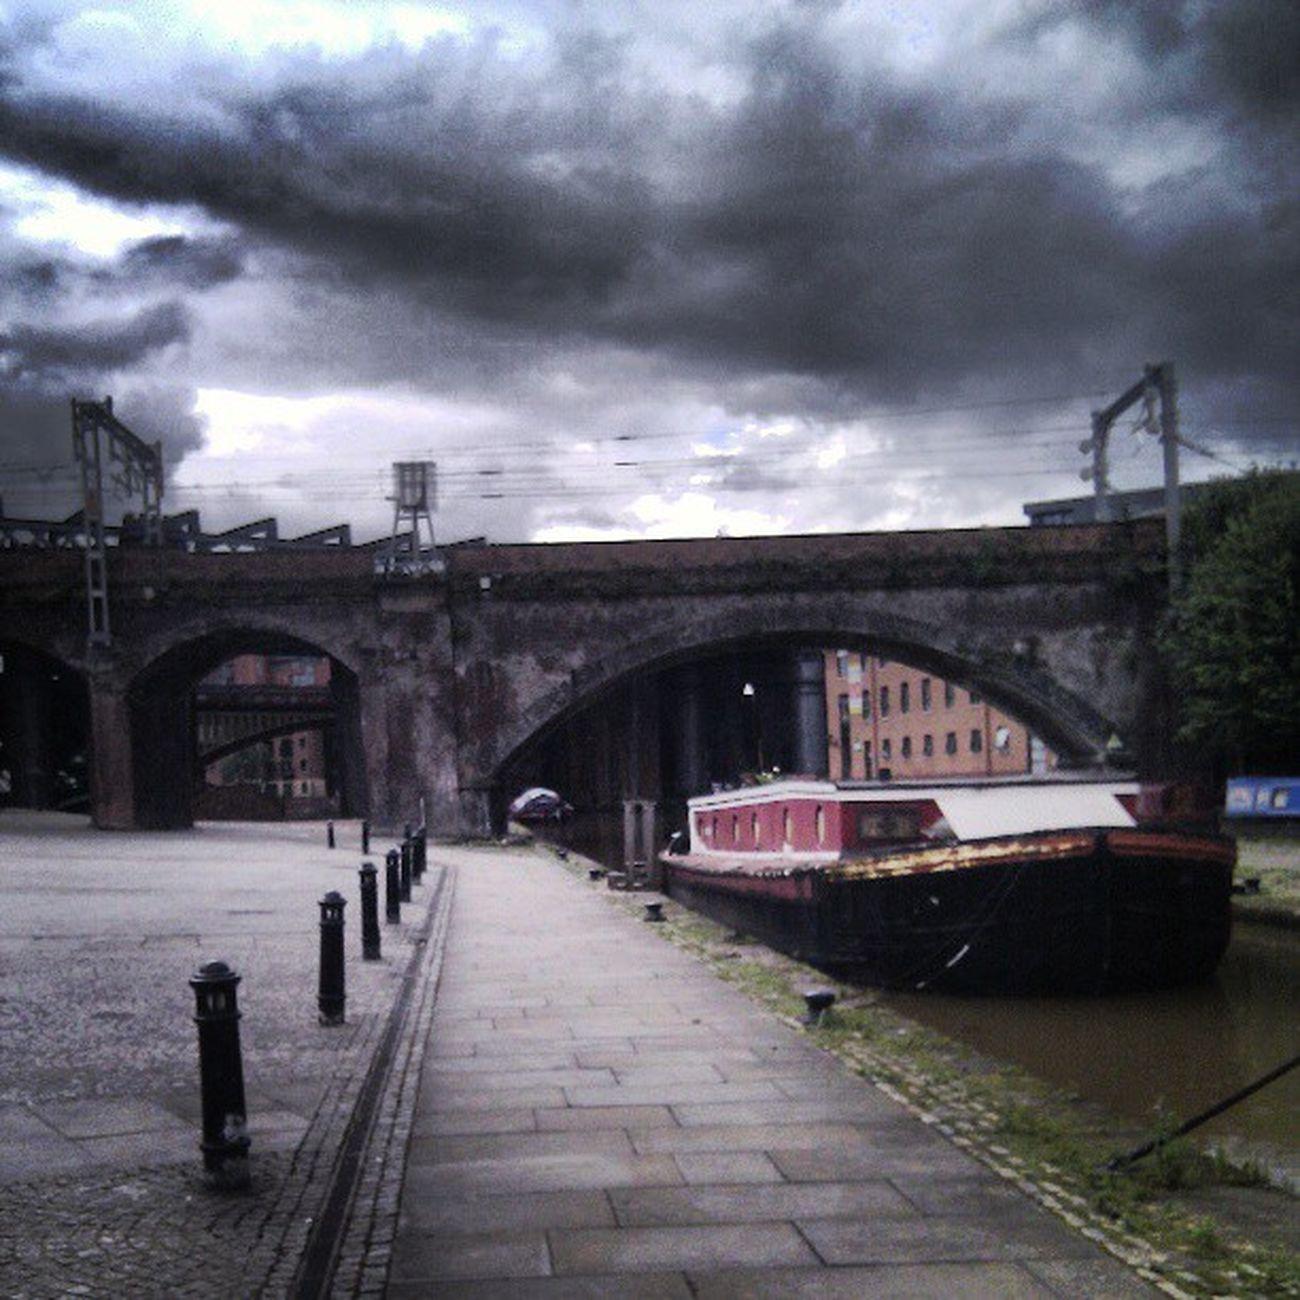 Sidewayscity Manchester Castlefield Lancashire clouds barge canal towpath city storm